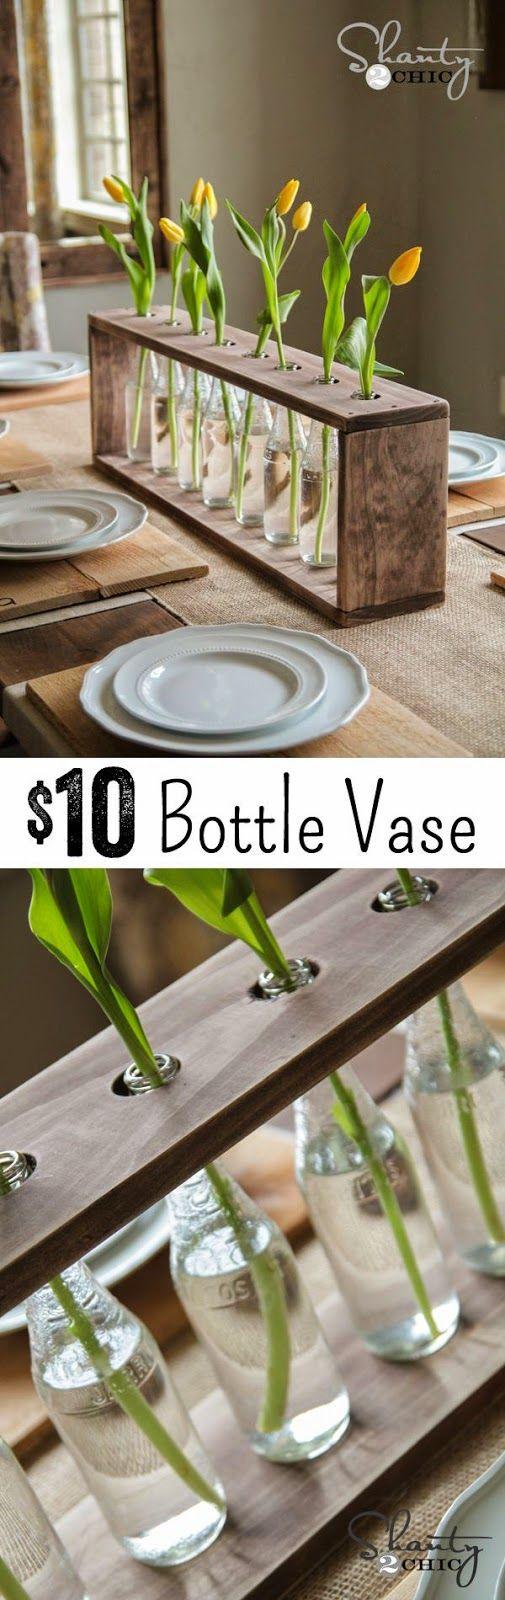 Interesting vase/centerpiece for budget friendly weddings